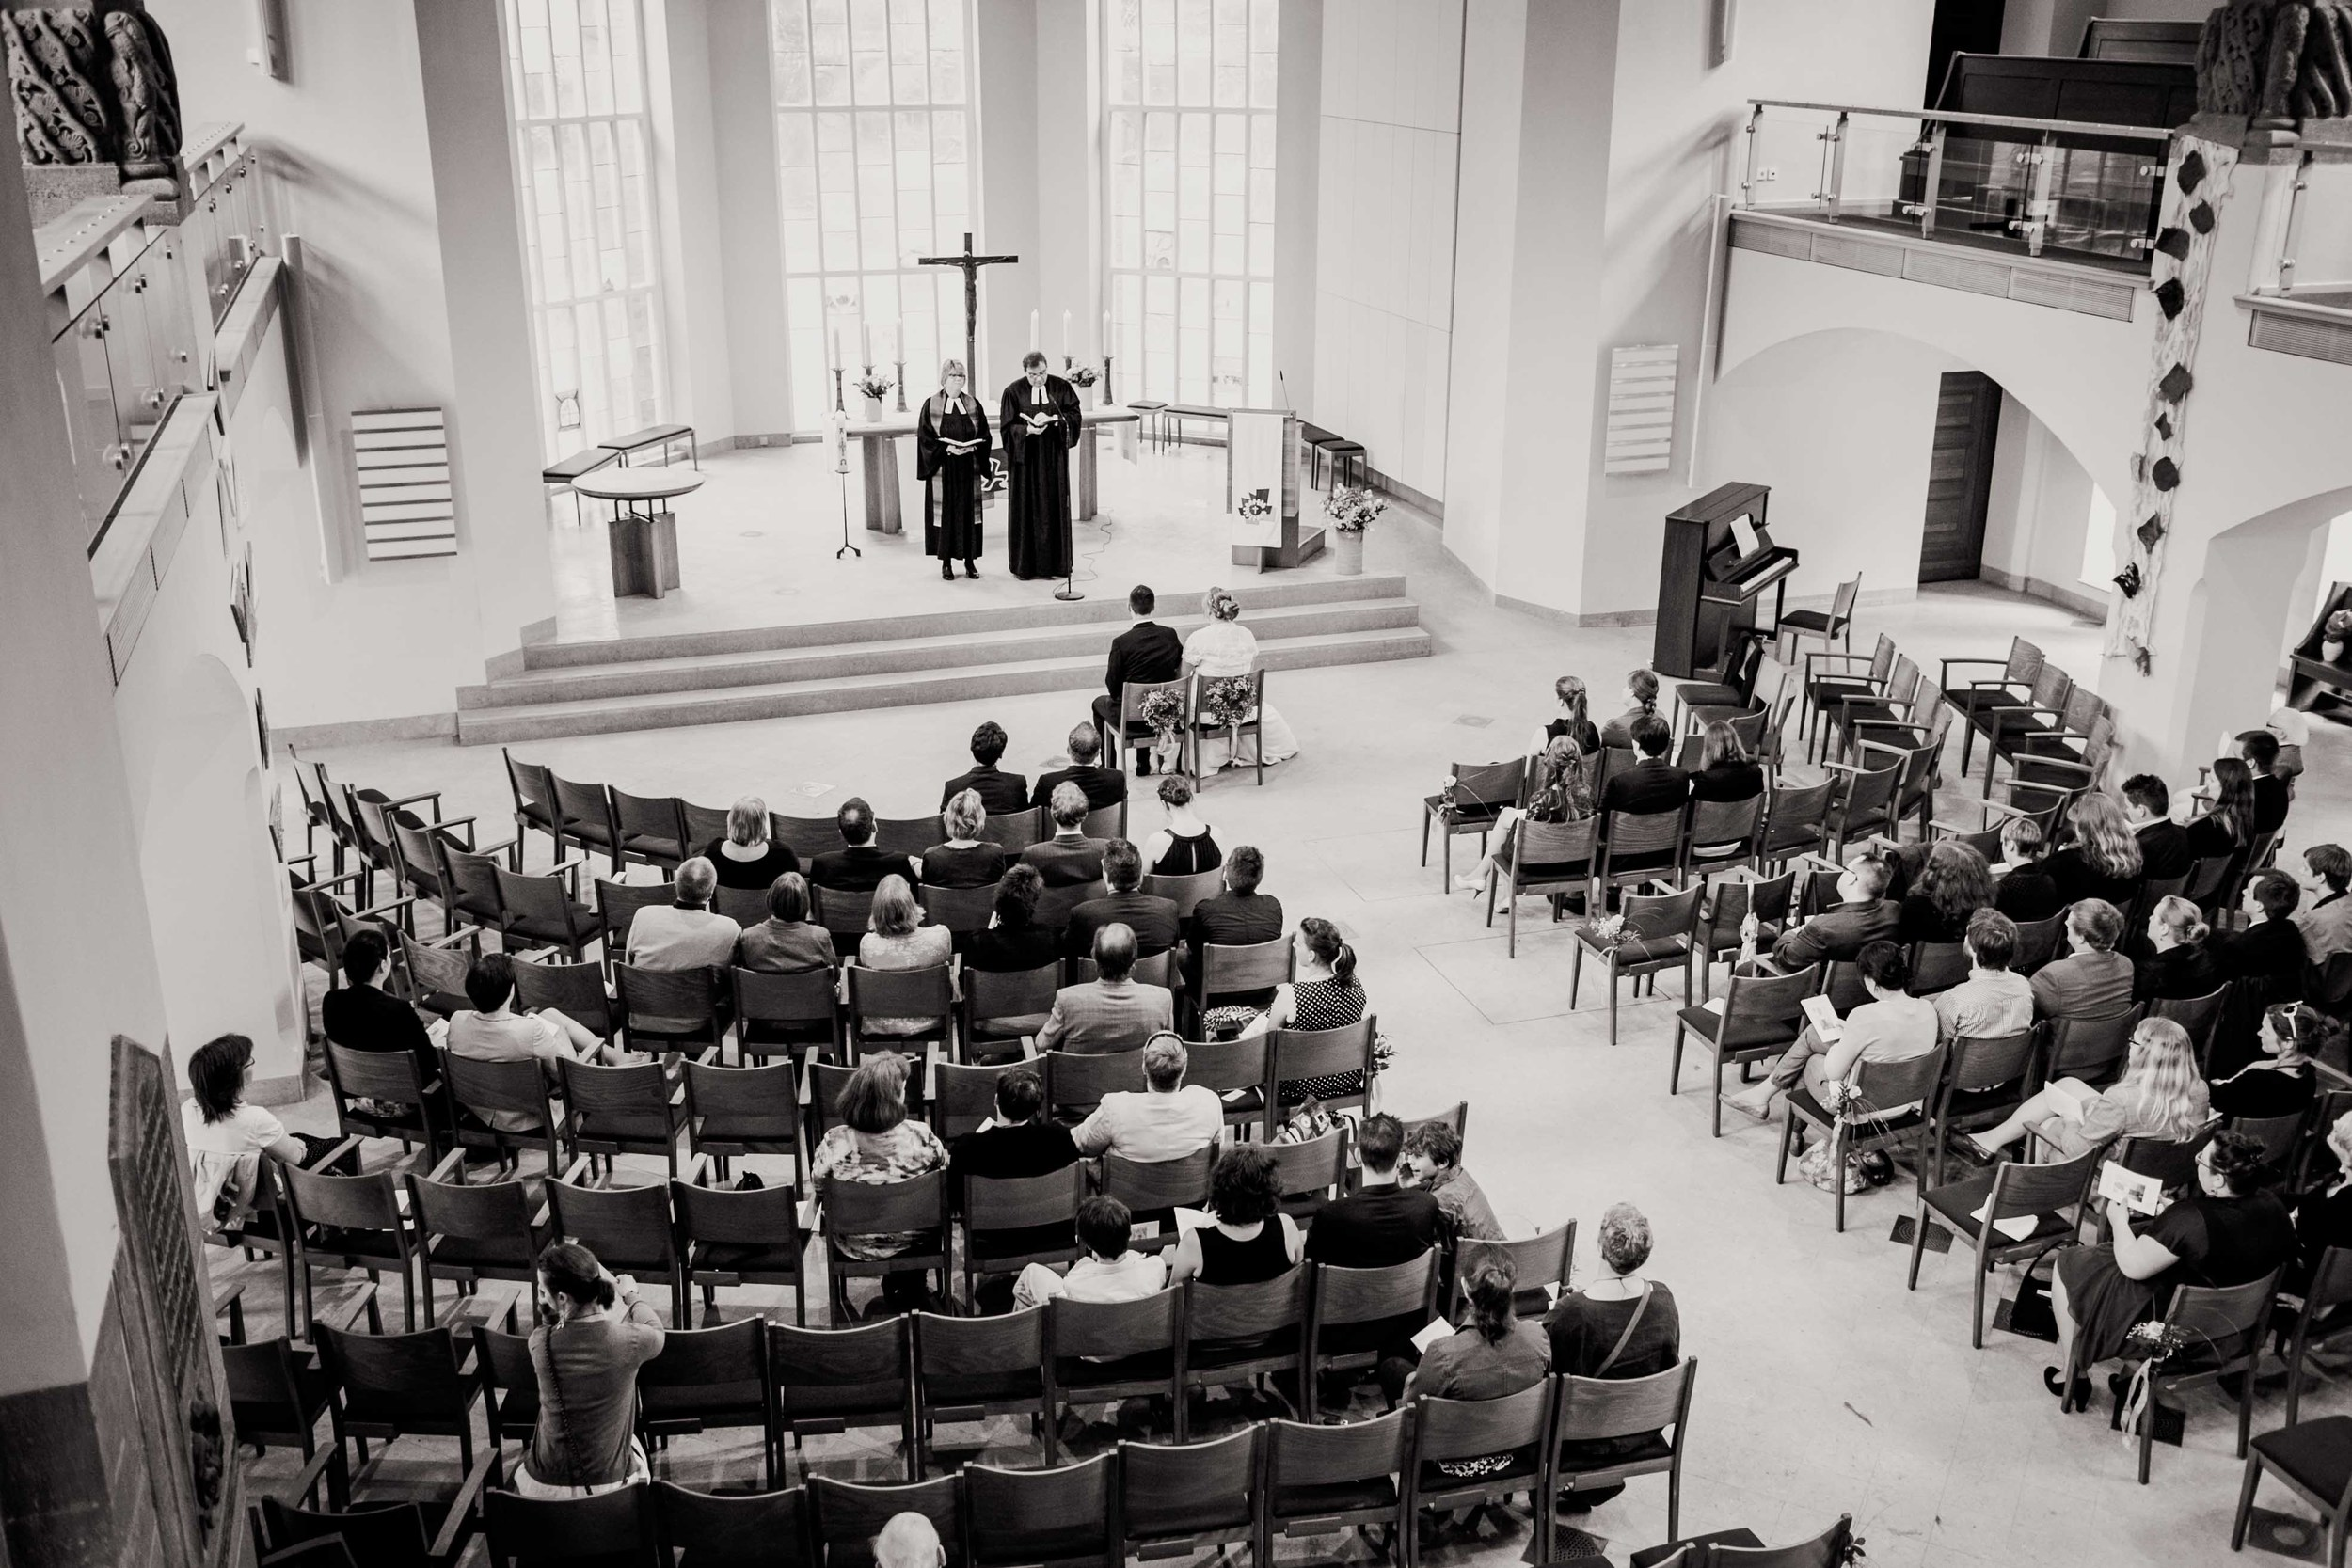 Berlin Hochzeitsfotografie_Fran Burrows-154.jpg